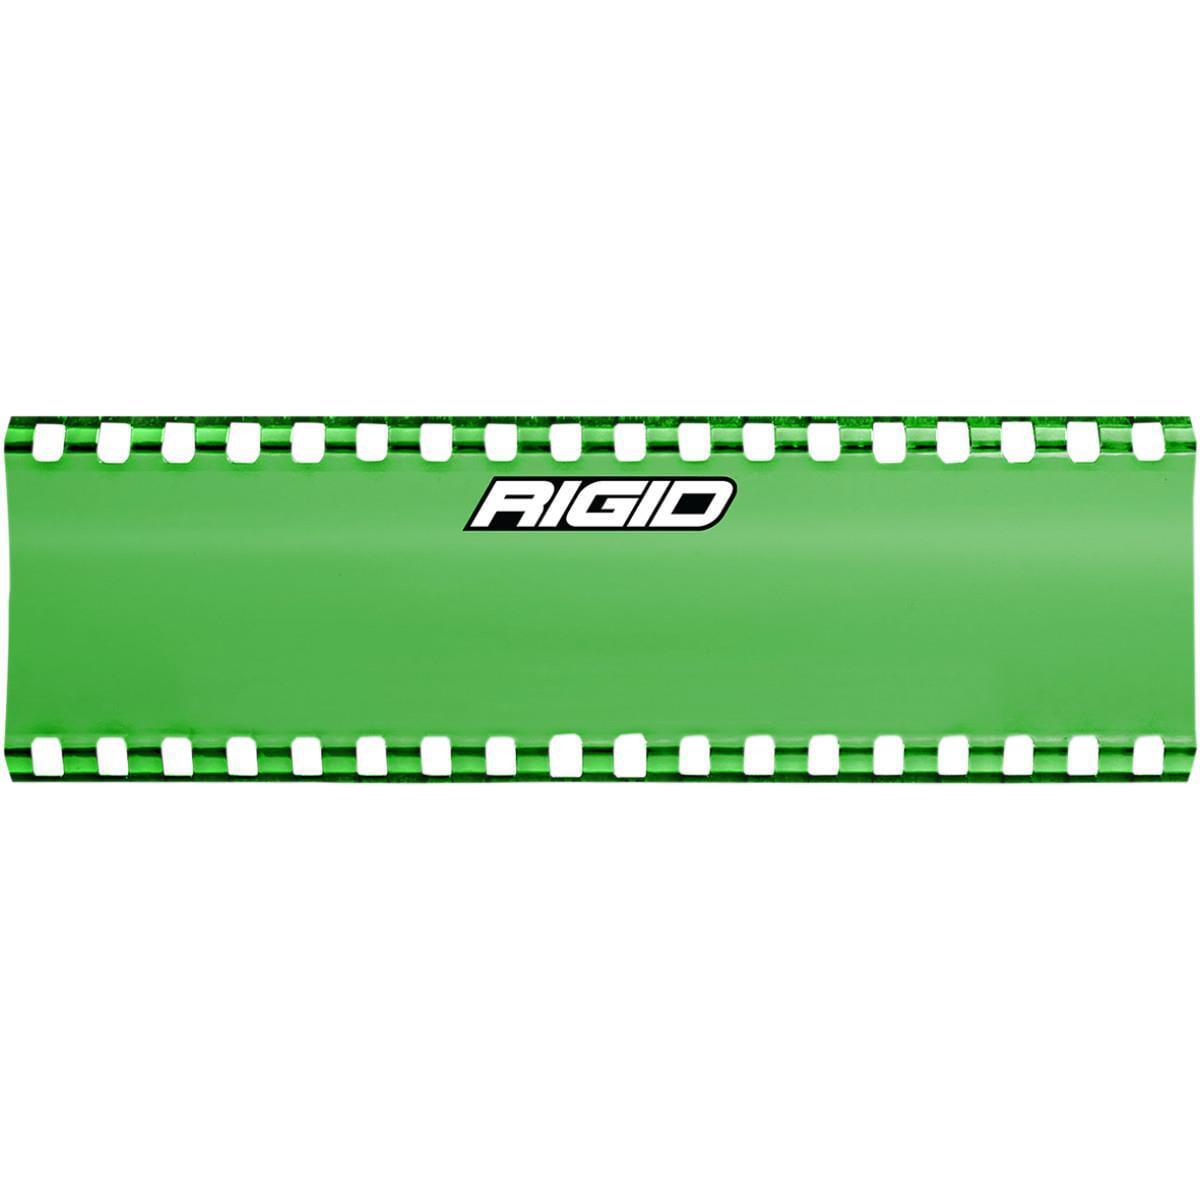 RIGID Industries 105893 6in. Light Cover for SR-Series Light Bar - Green